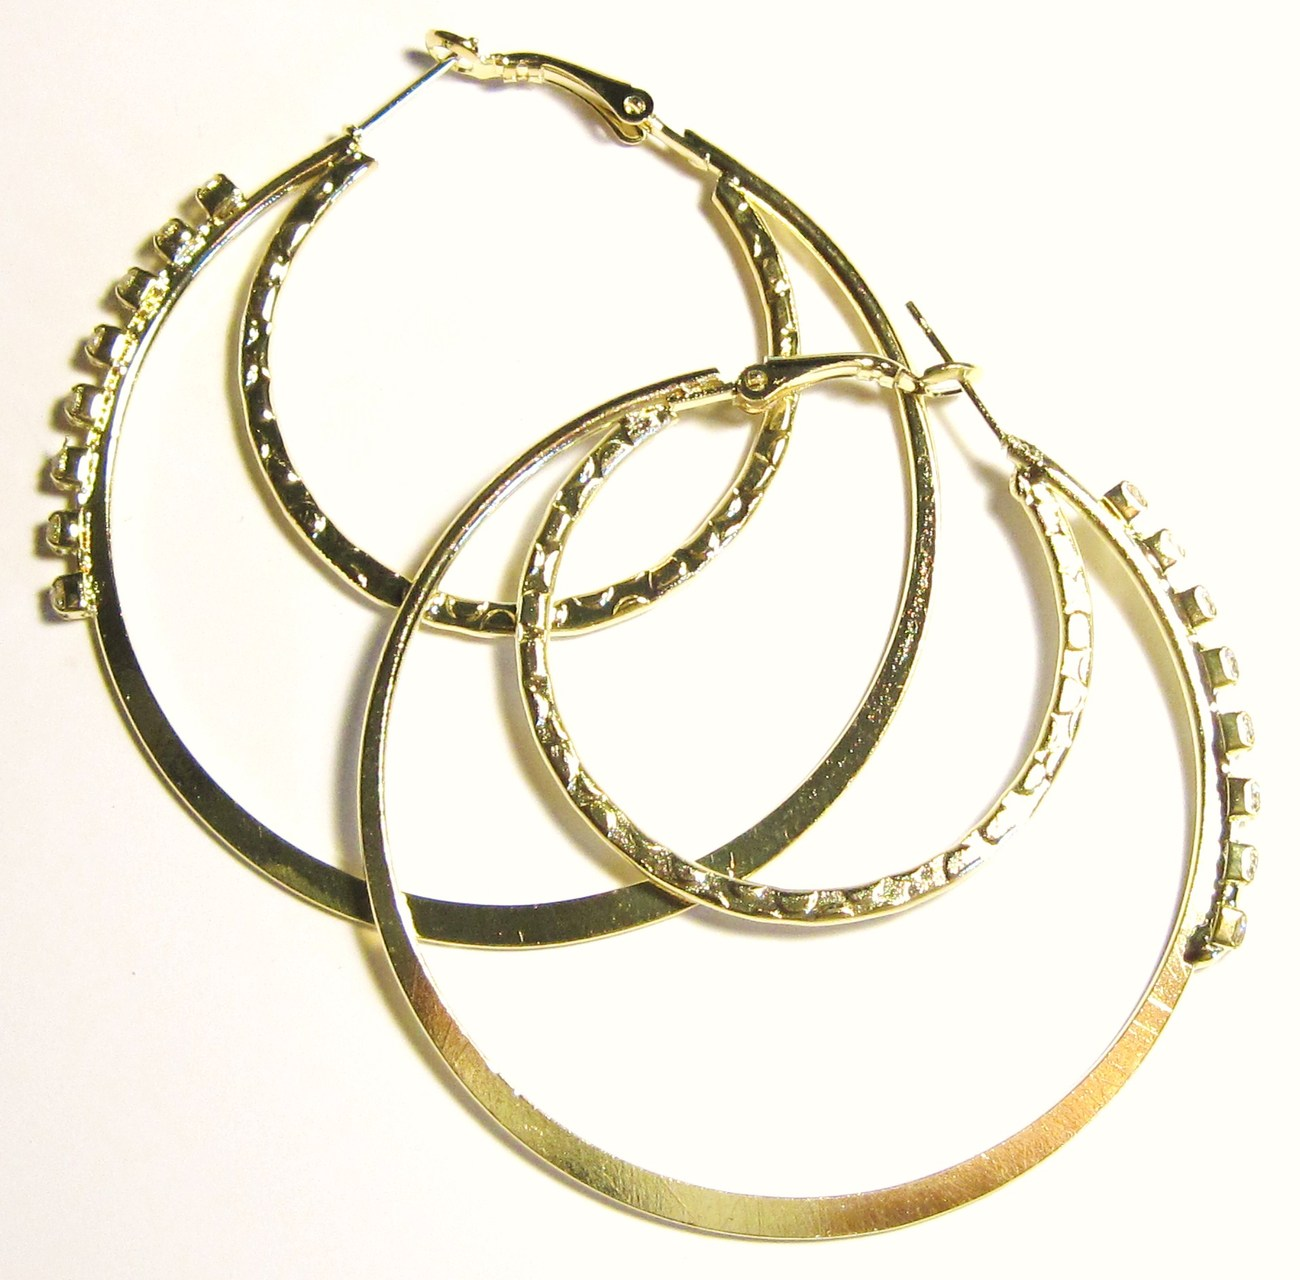 Ea102 cz gold double hoop